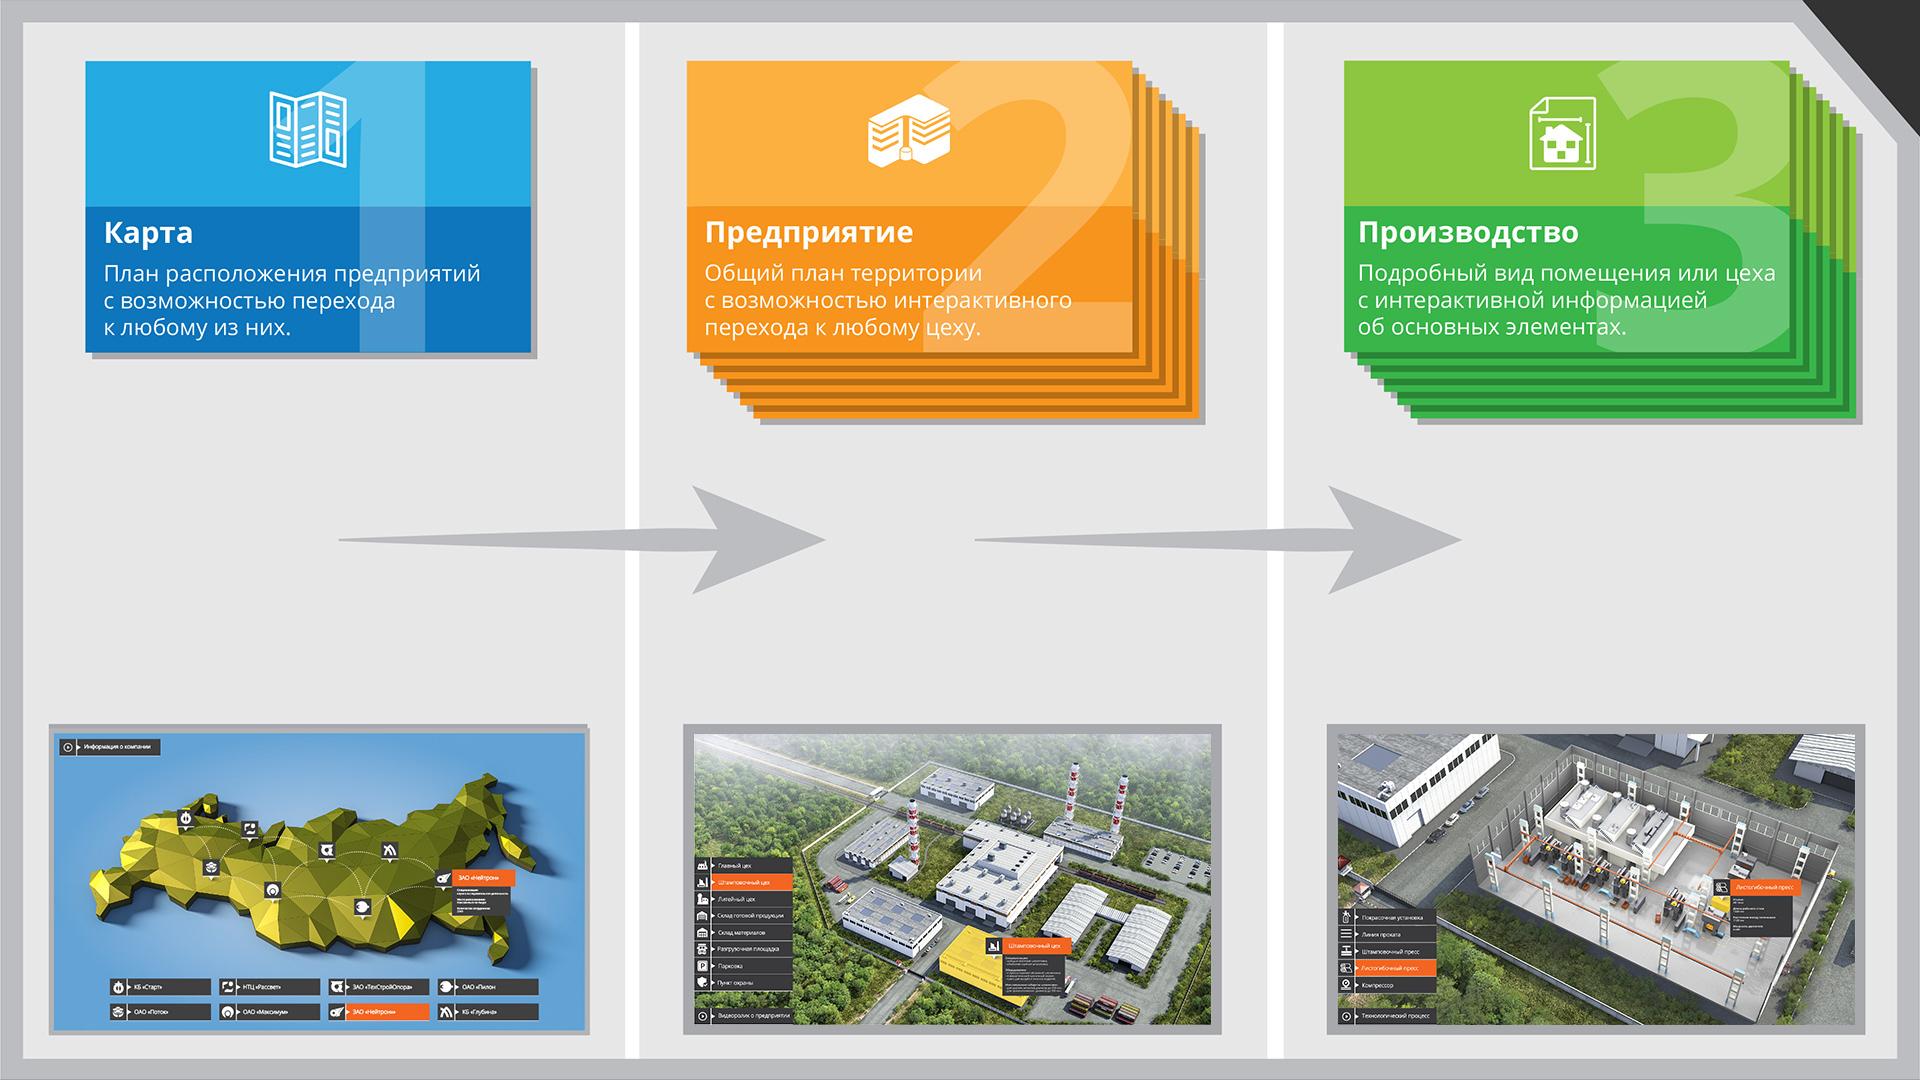 company presentation img03 5 Интерактивные презентации